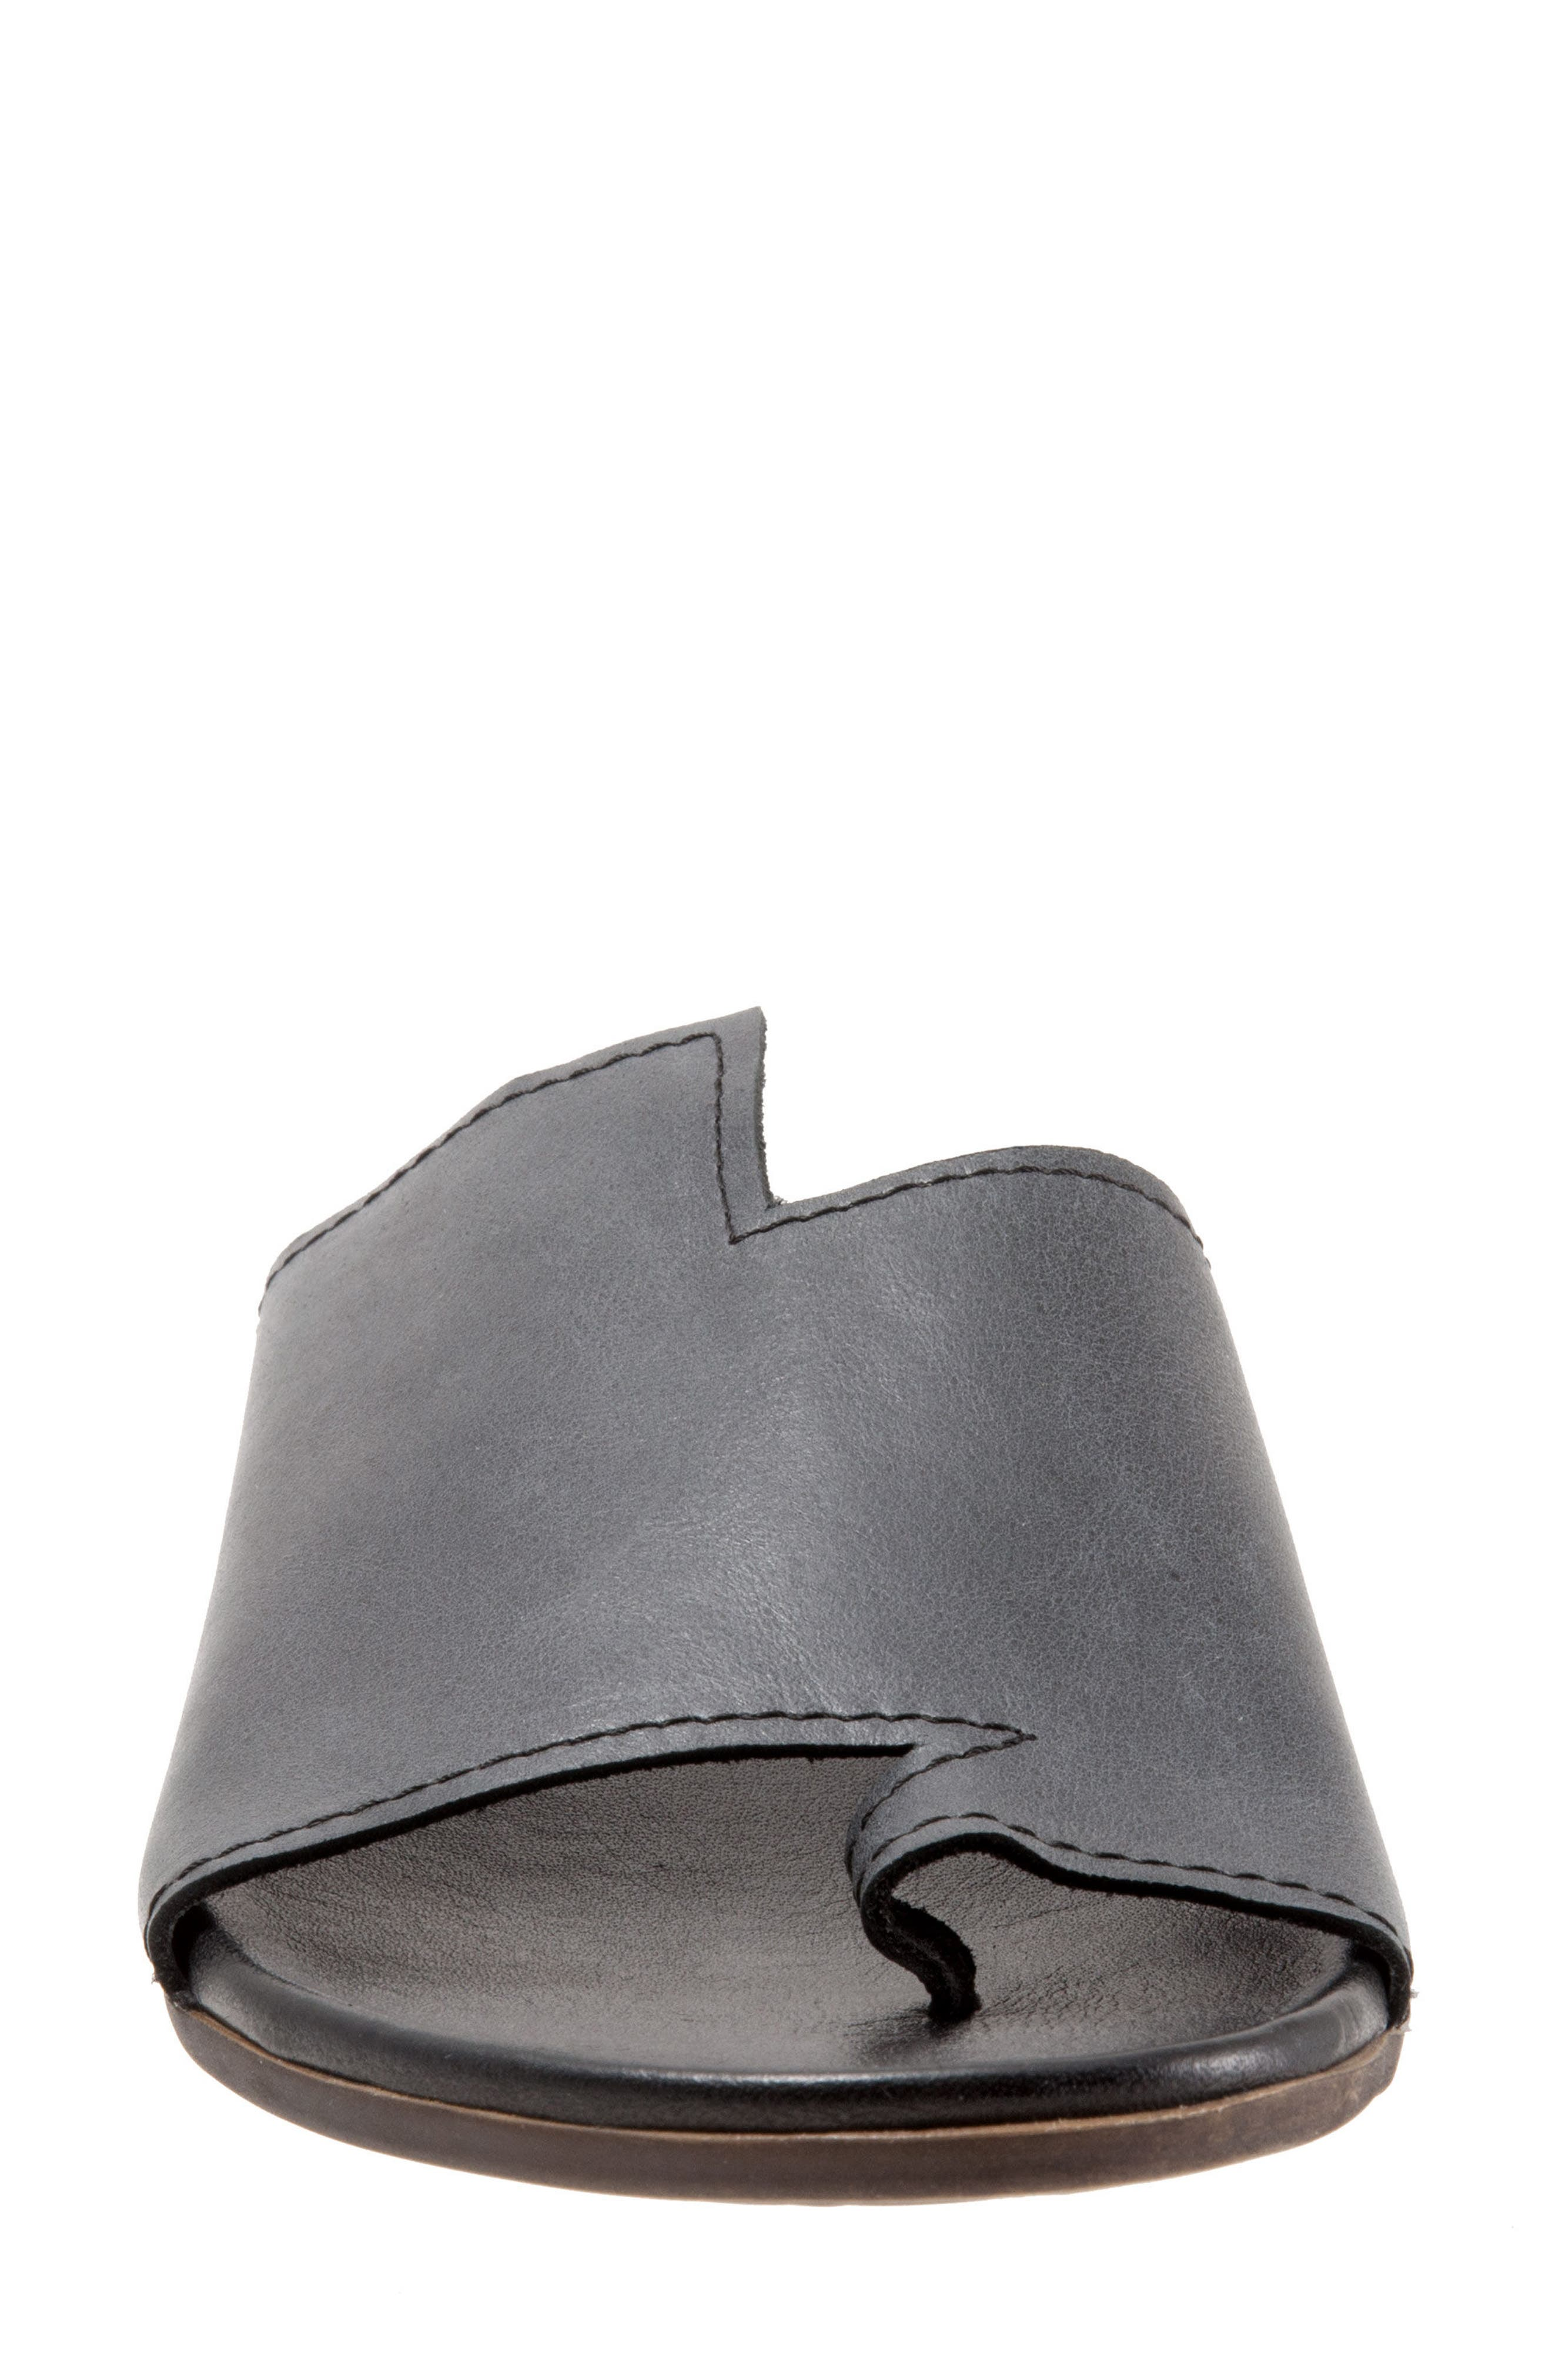 Tulla Sandal,                             Alternate thumbnail 4, color,                             Black Leather